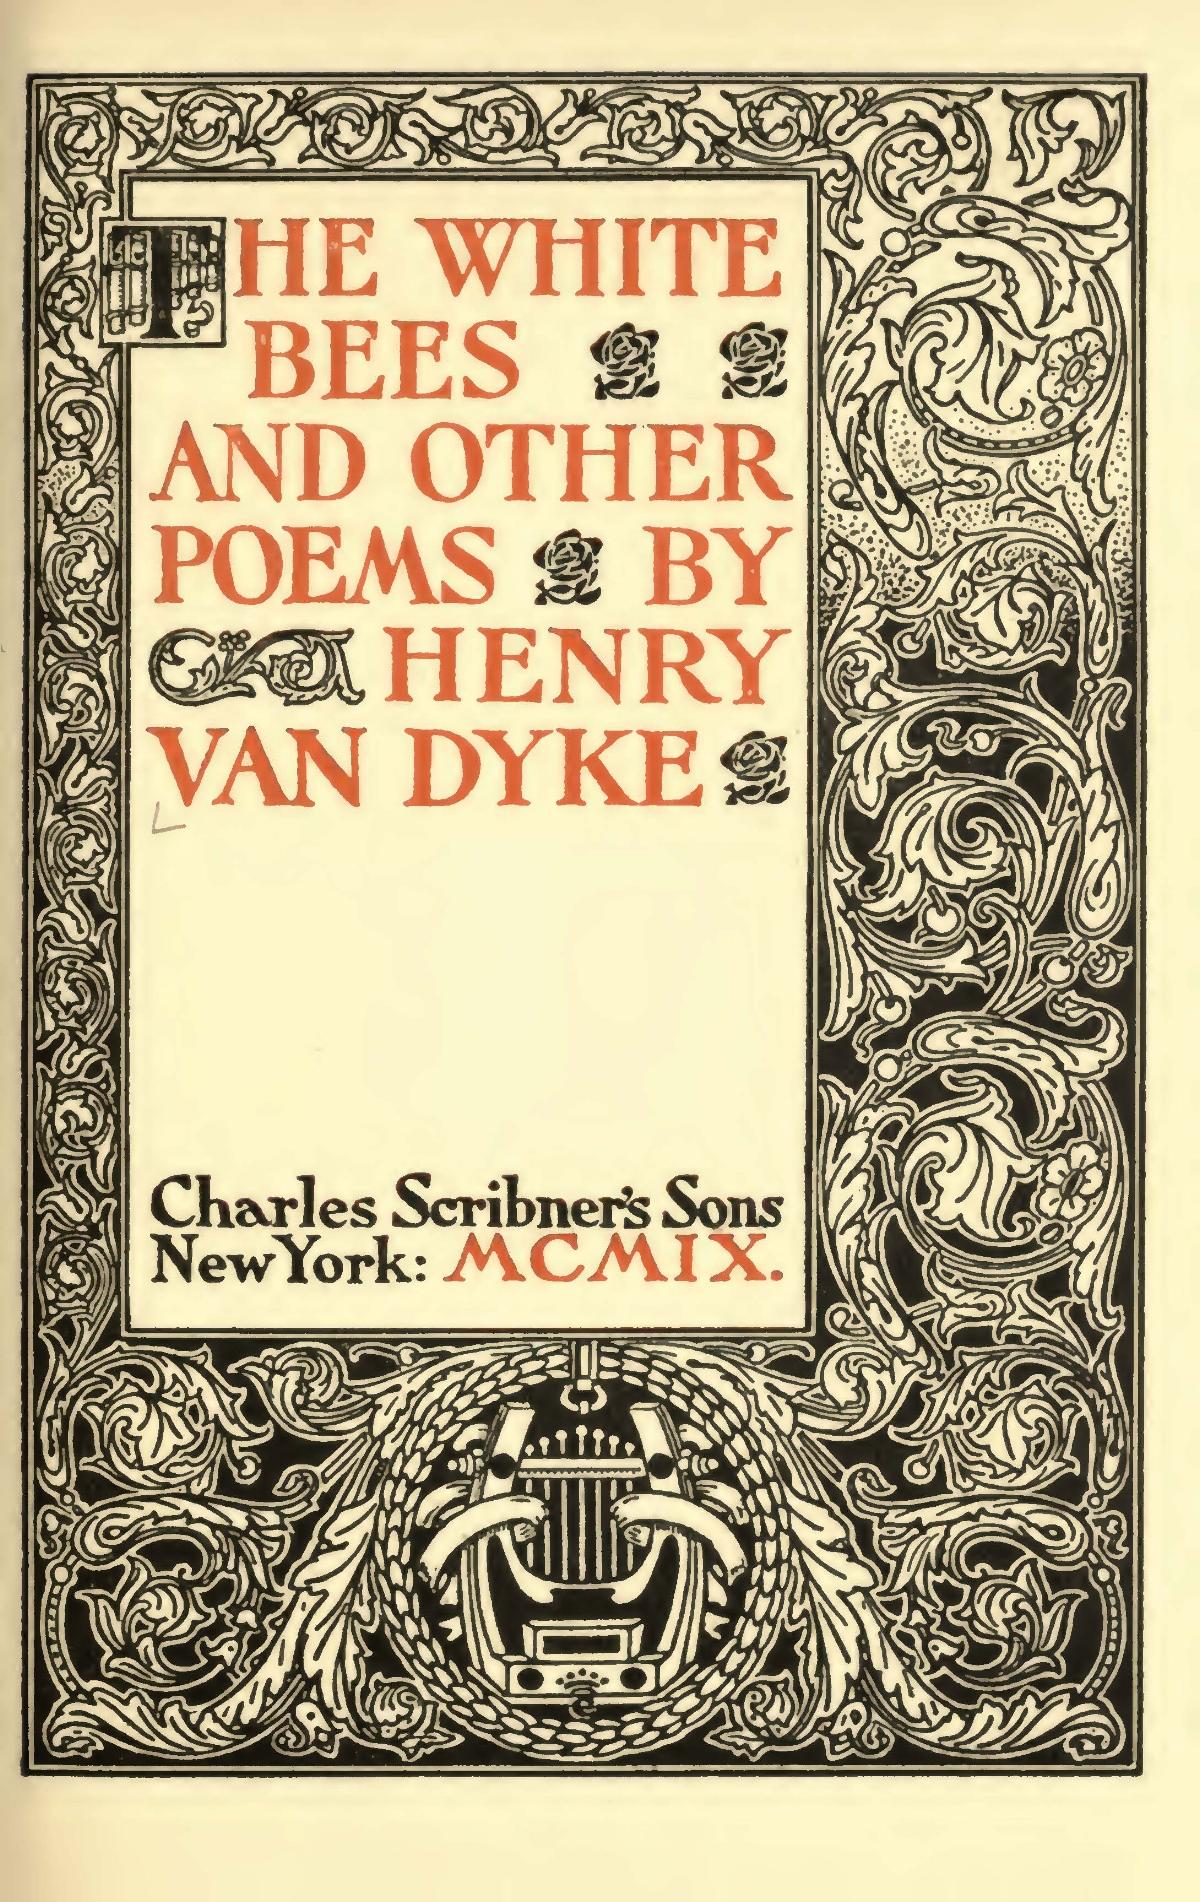 Van Dyke, Jr., Henry Jackson, The White Bees Title Page.jpg